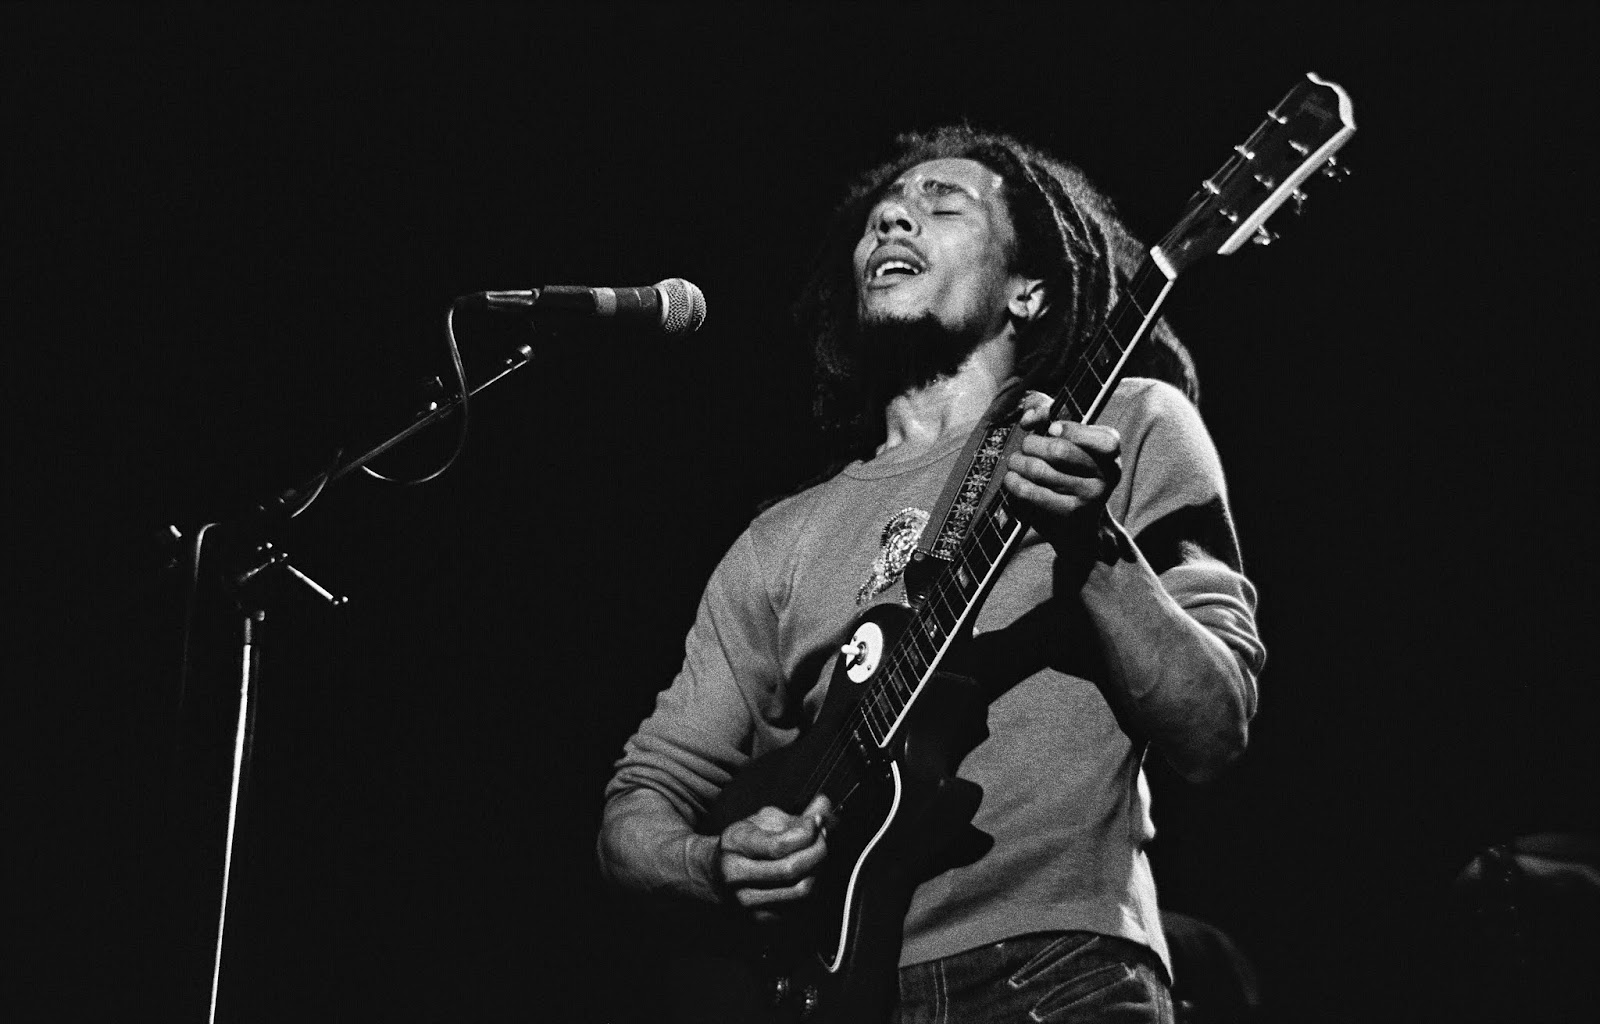 Bob Marley: VintageRock.com News: January 2015